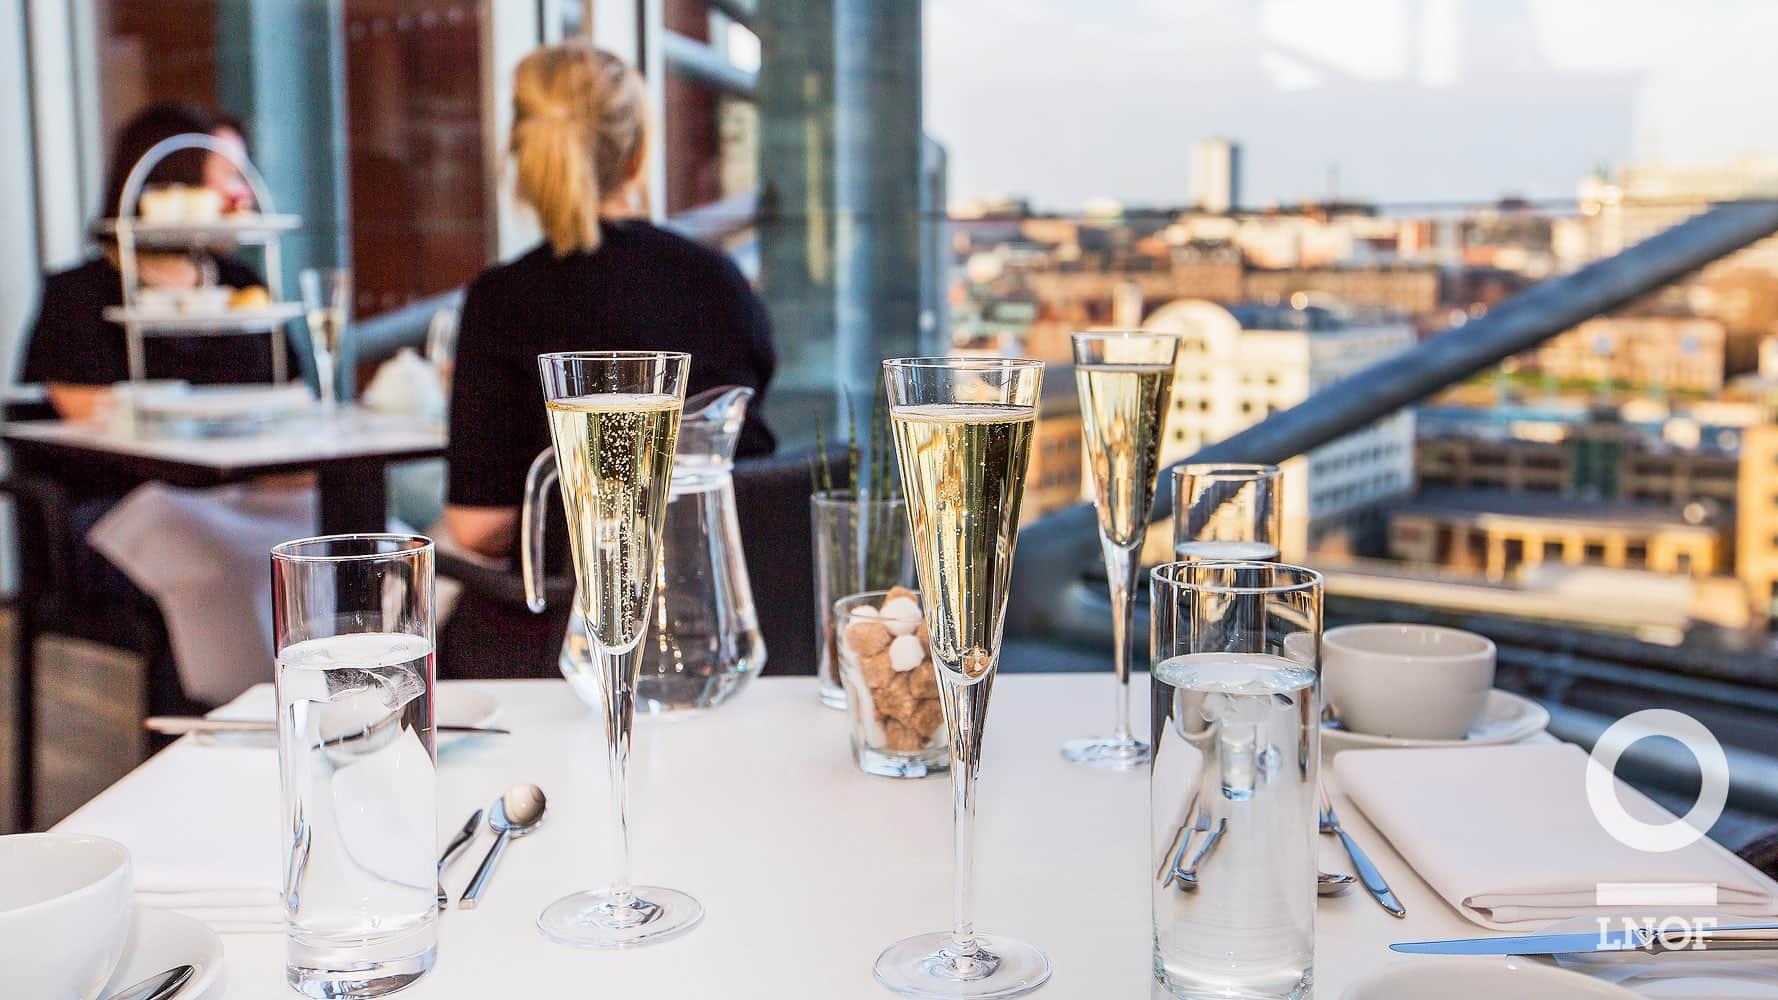 Champagne flutes in restaurant